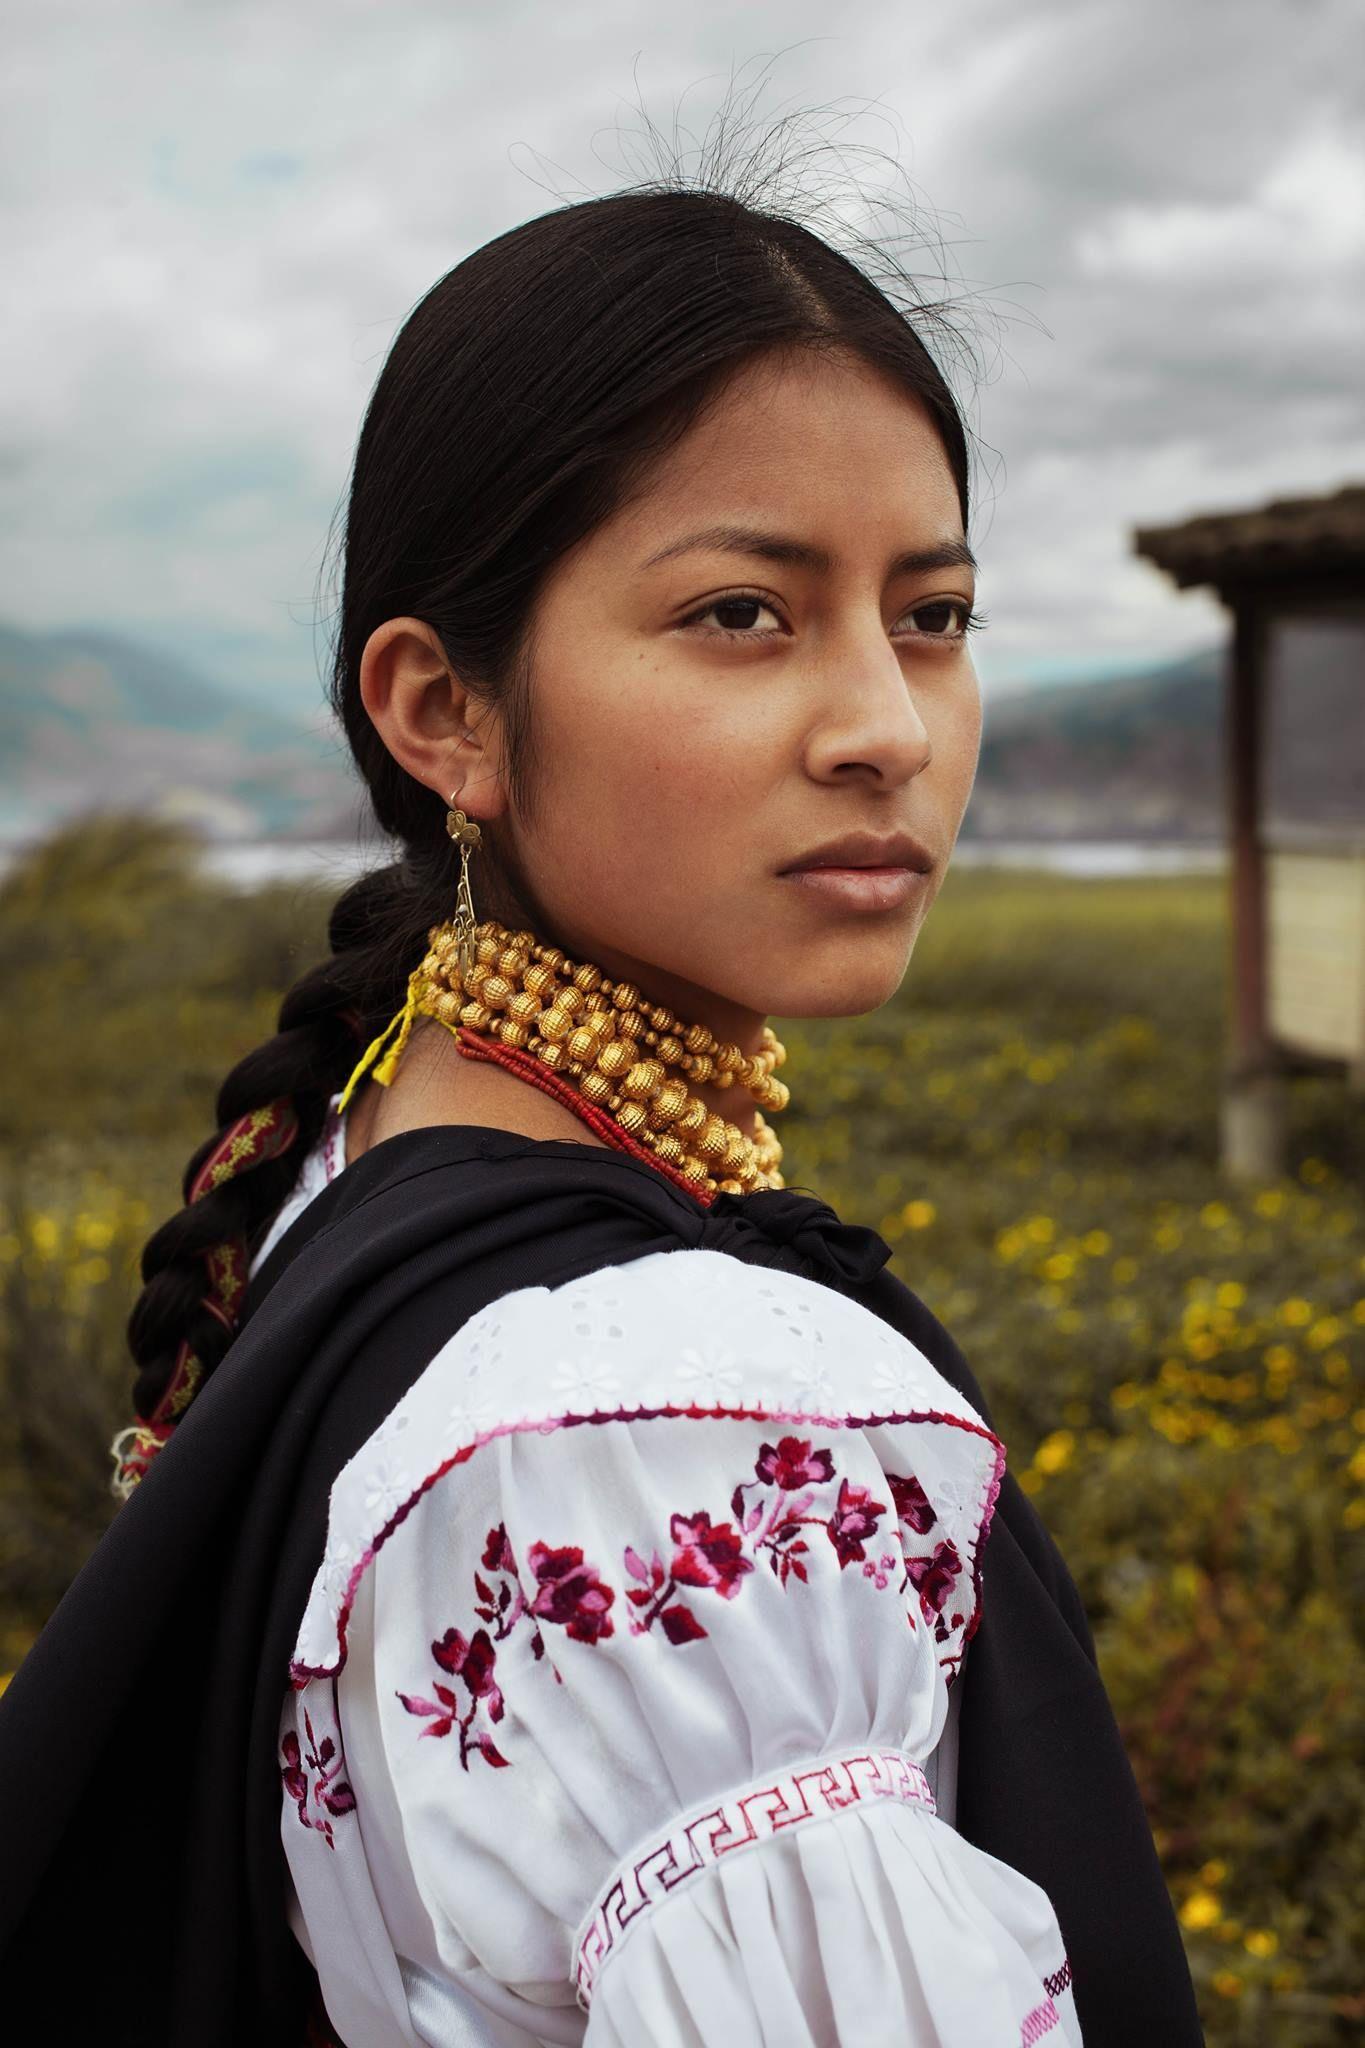 Картинки по запросу эквадор женщины